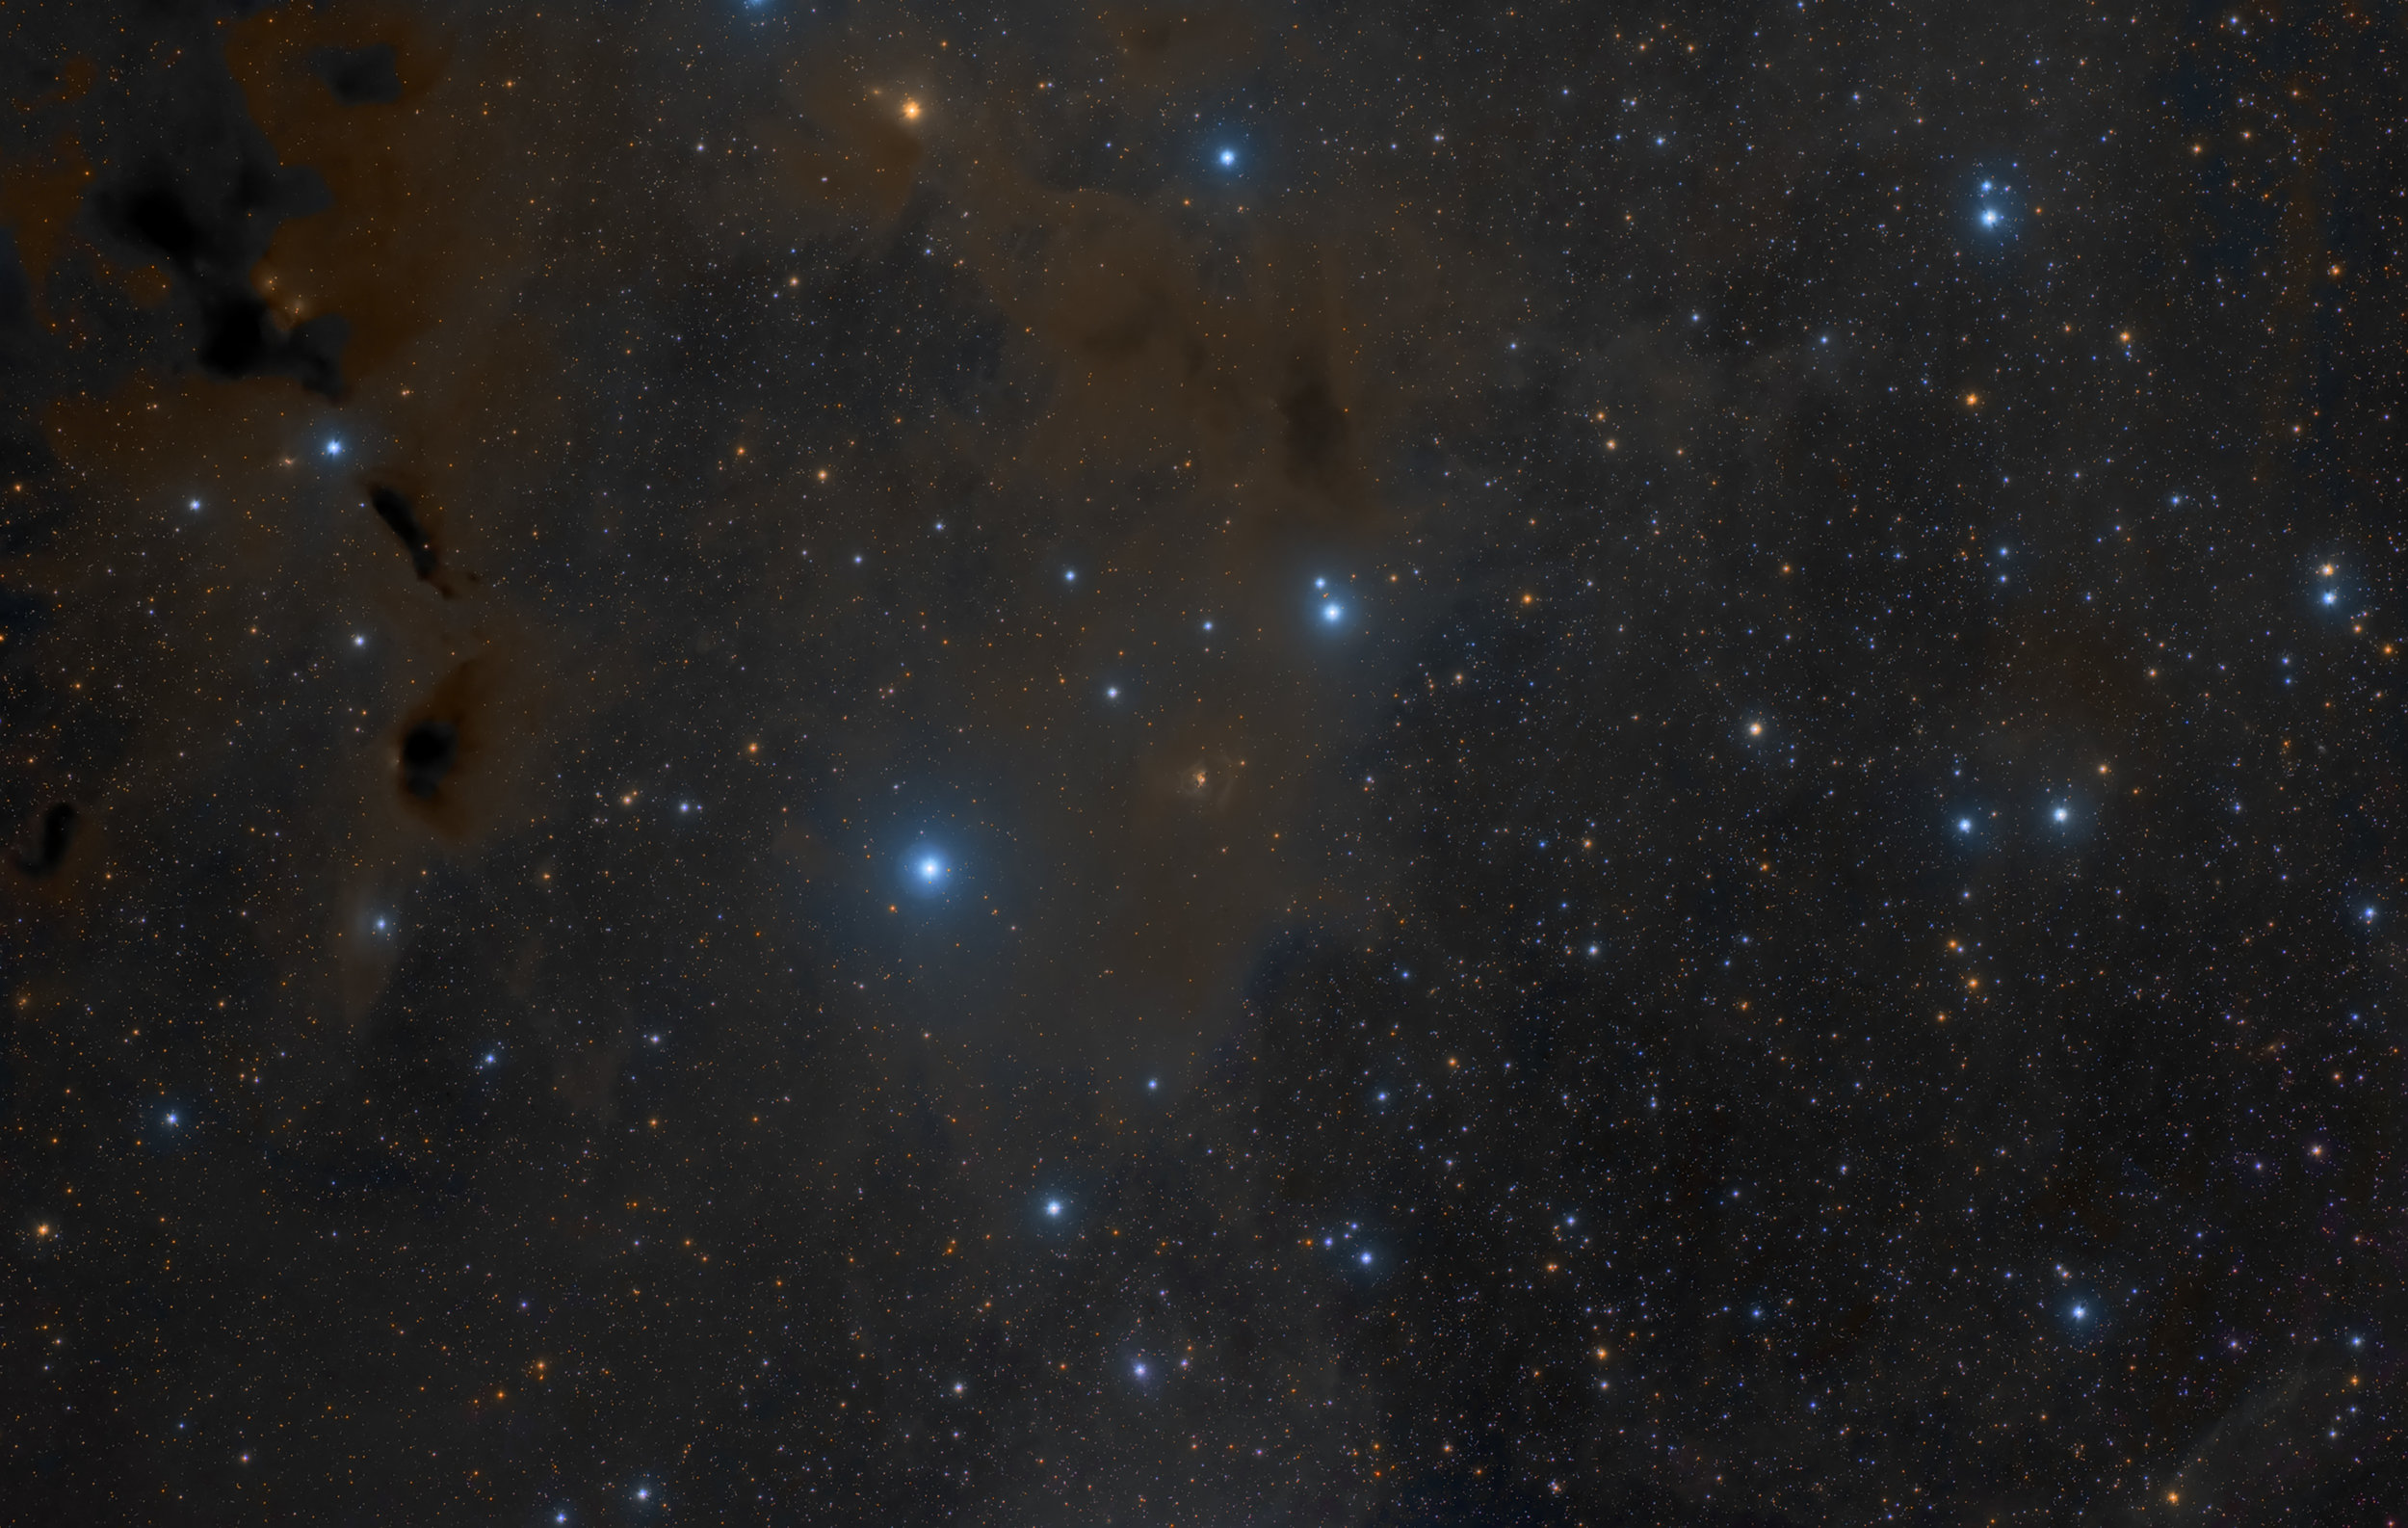 DG 41, also named GN 04.32.08, Magakian 77, or Bernes 83.